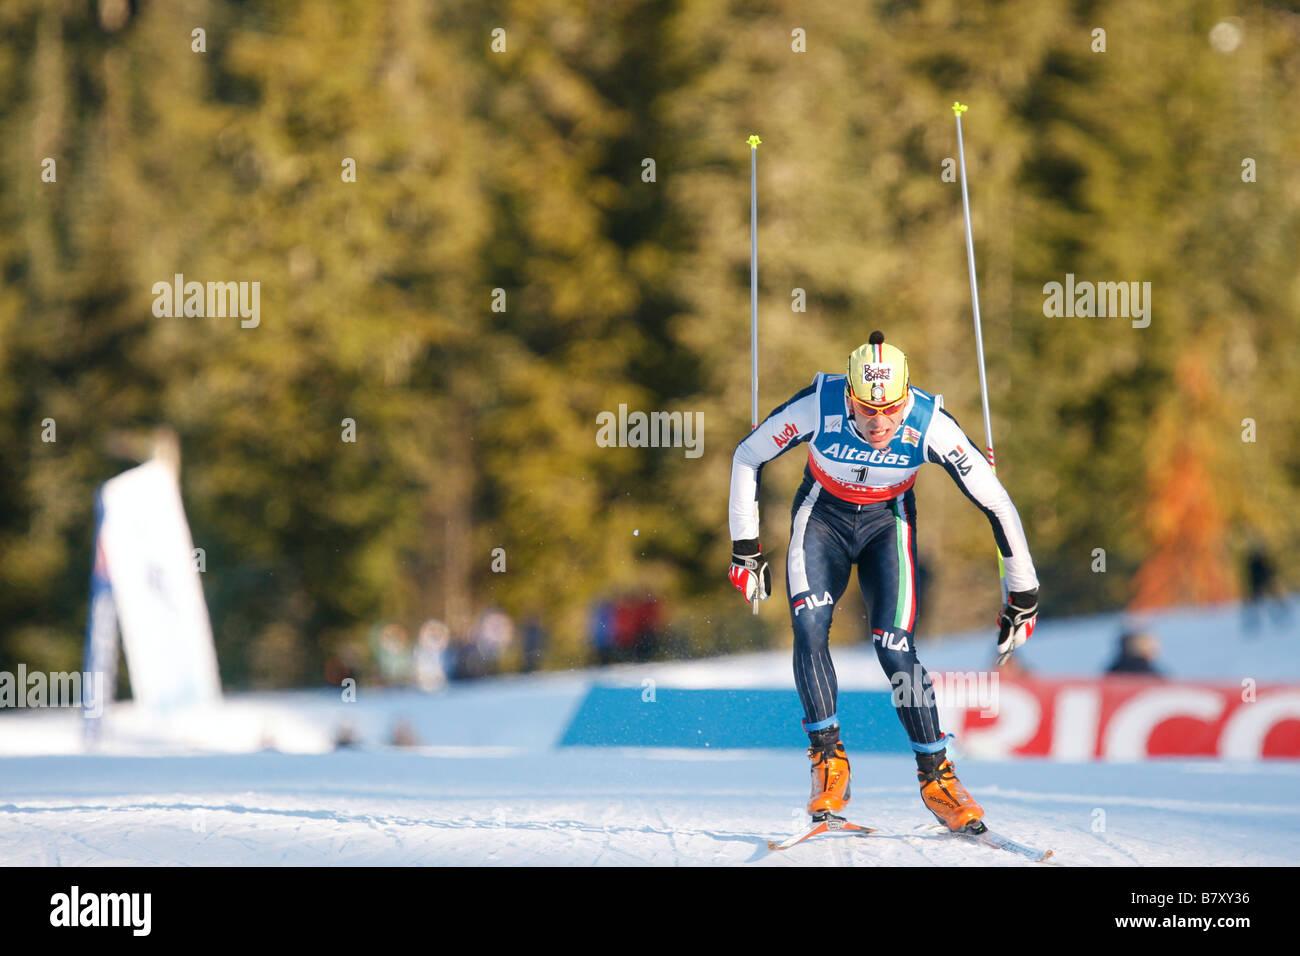 Pietro Piller Cottrer ITA JANUARY 17 2008 Cross Country Skiing VIESSMANN FIS Cross Country World Cup Mens 30km Pursuit - Stock Image